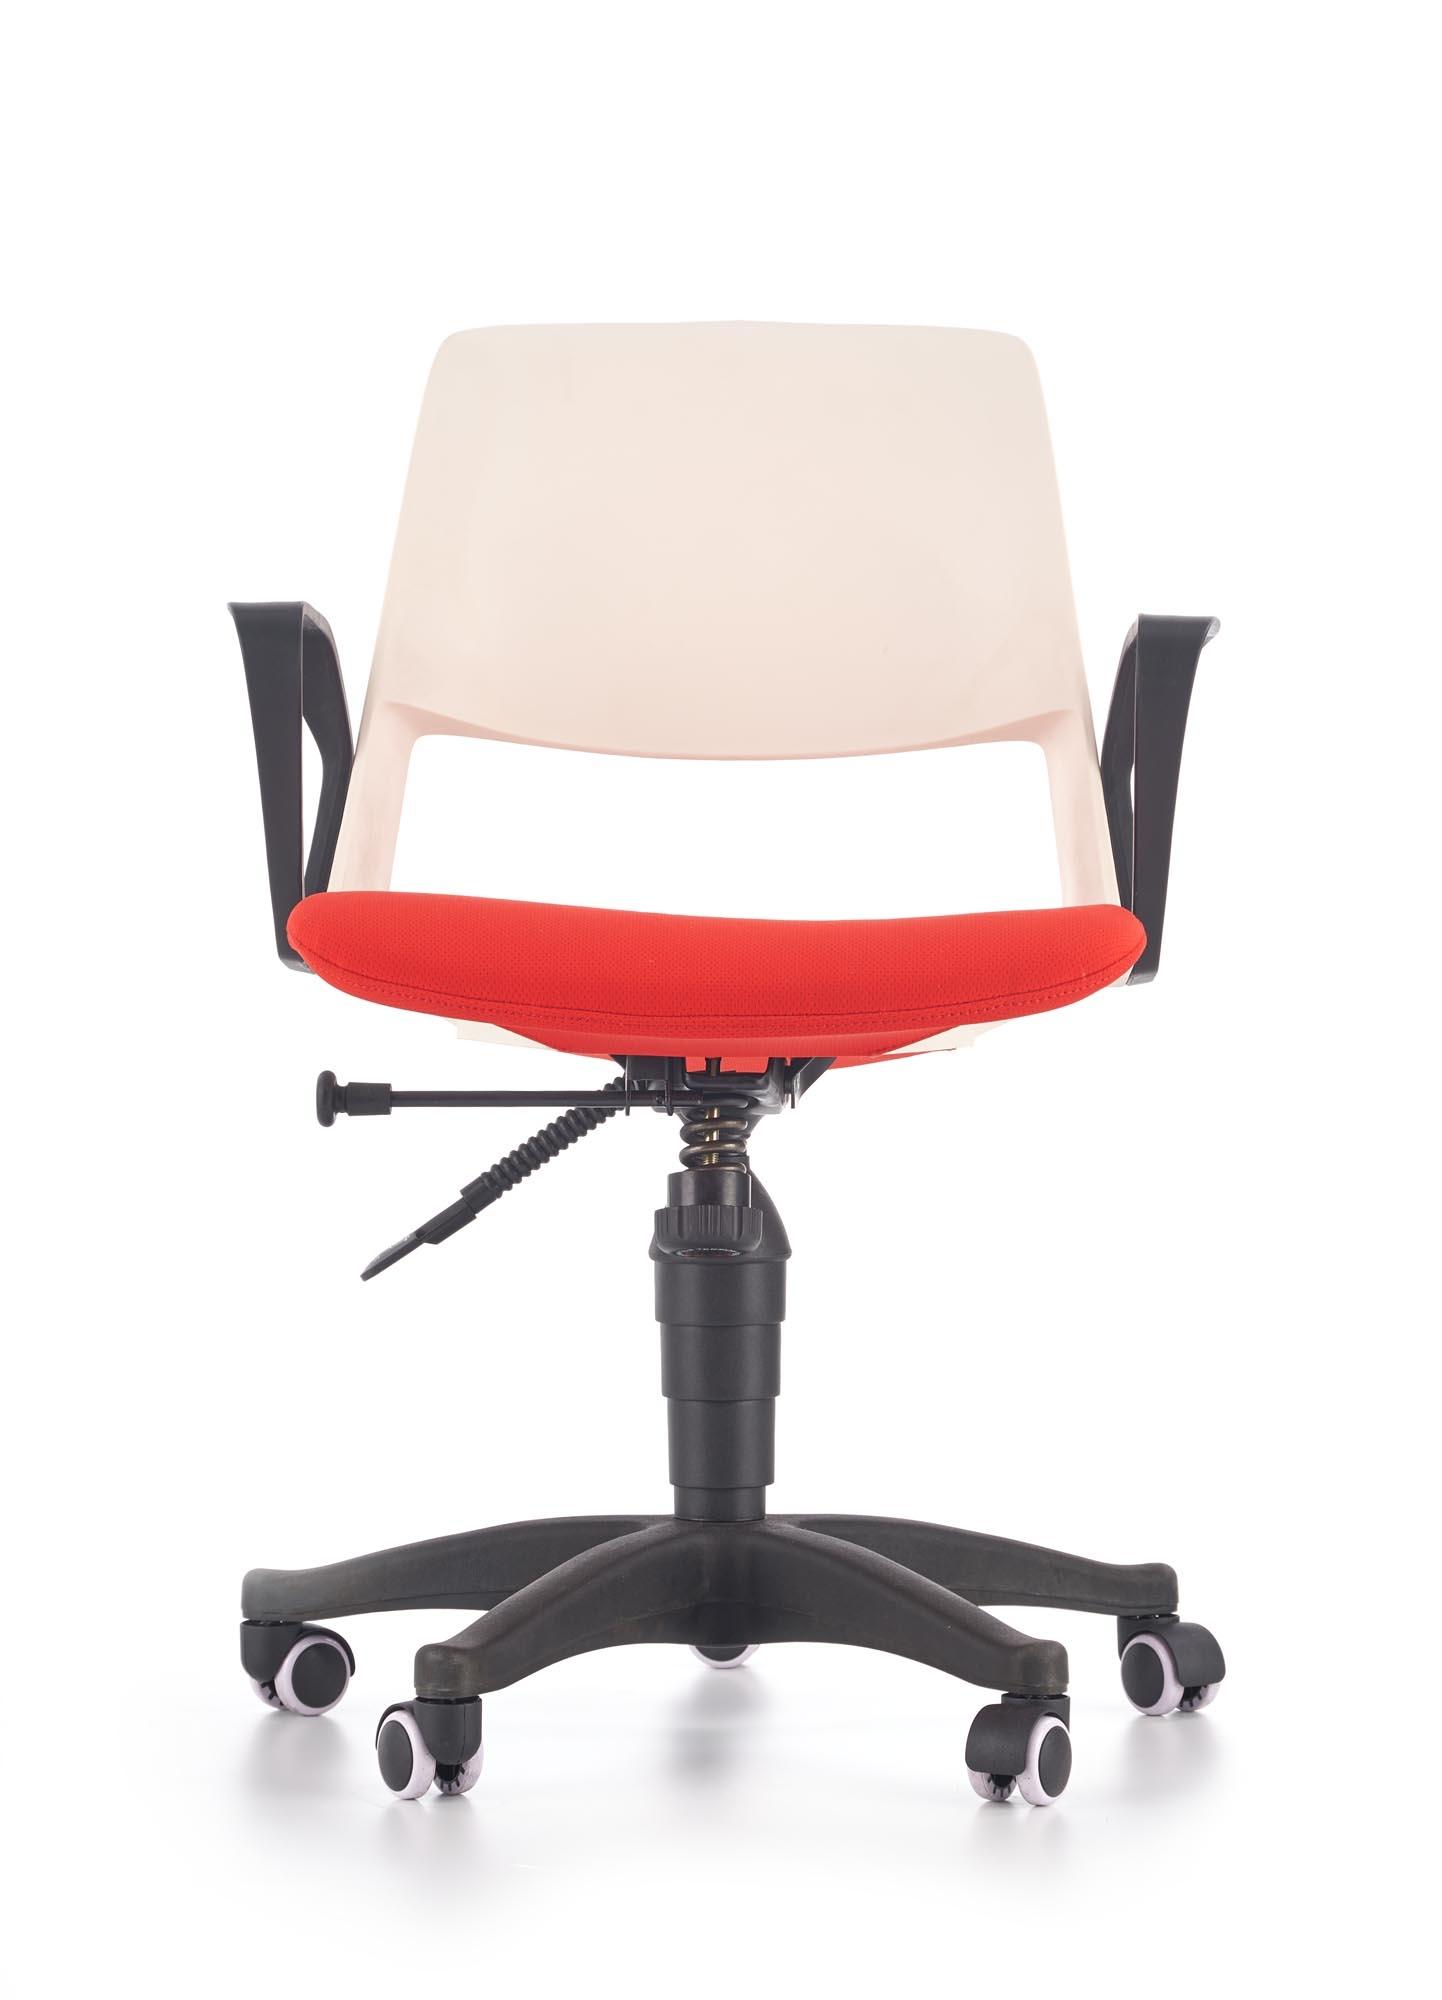 Scaun de birou pentru copii, tapitat cu stofa Janise Alb / Rosu, l60xA50xH84-93 cm